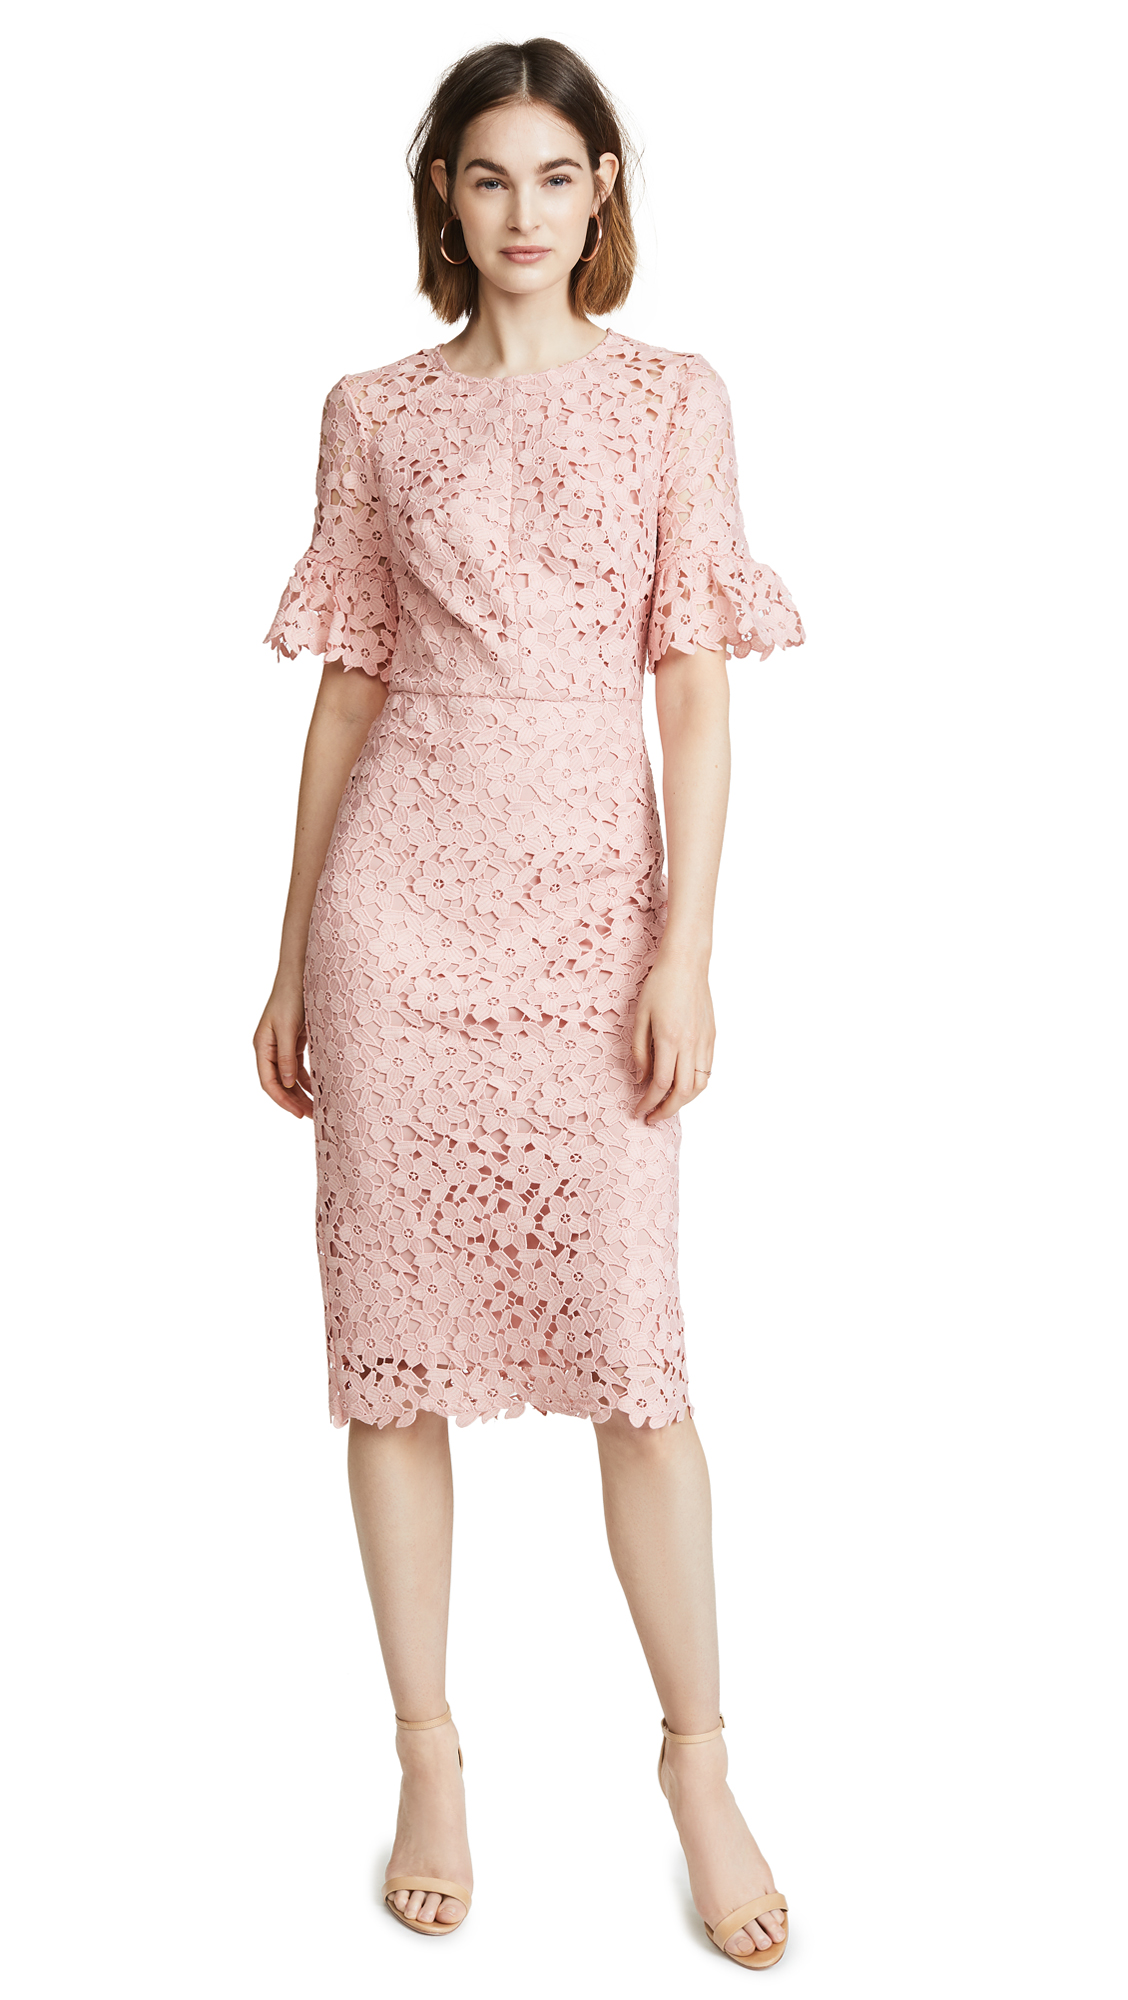 Shoshanna Flare Sleeve Dress